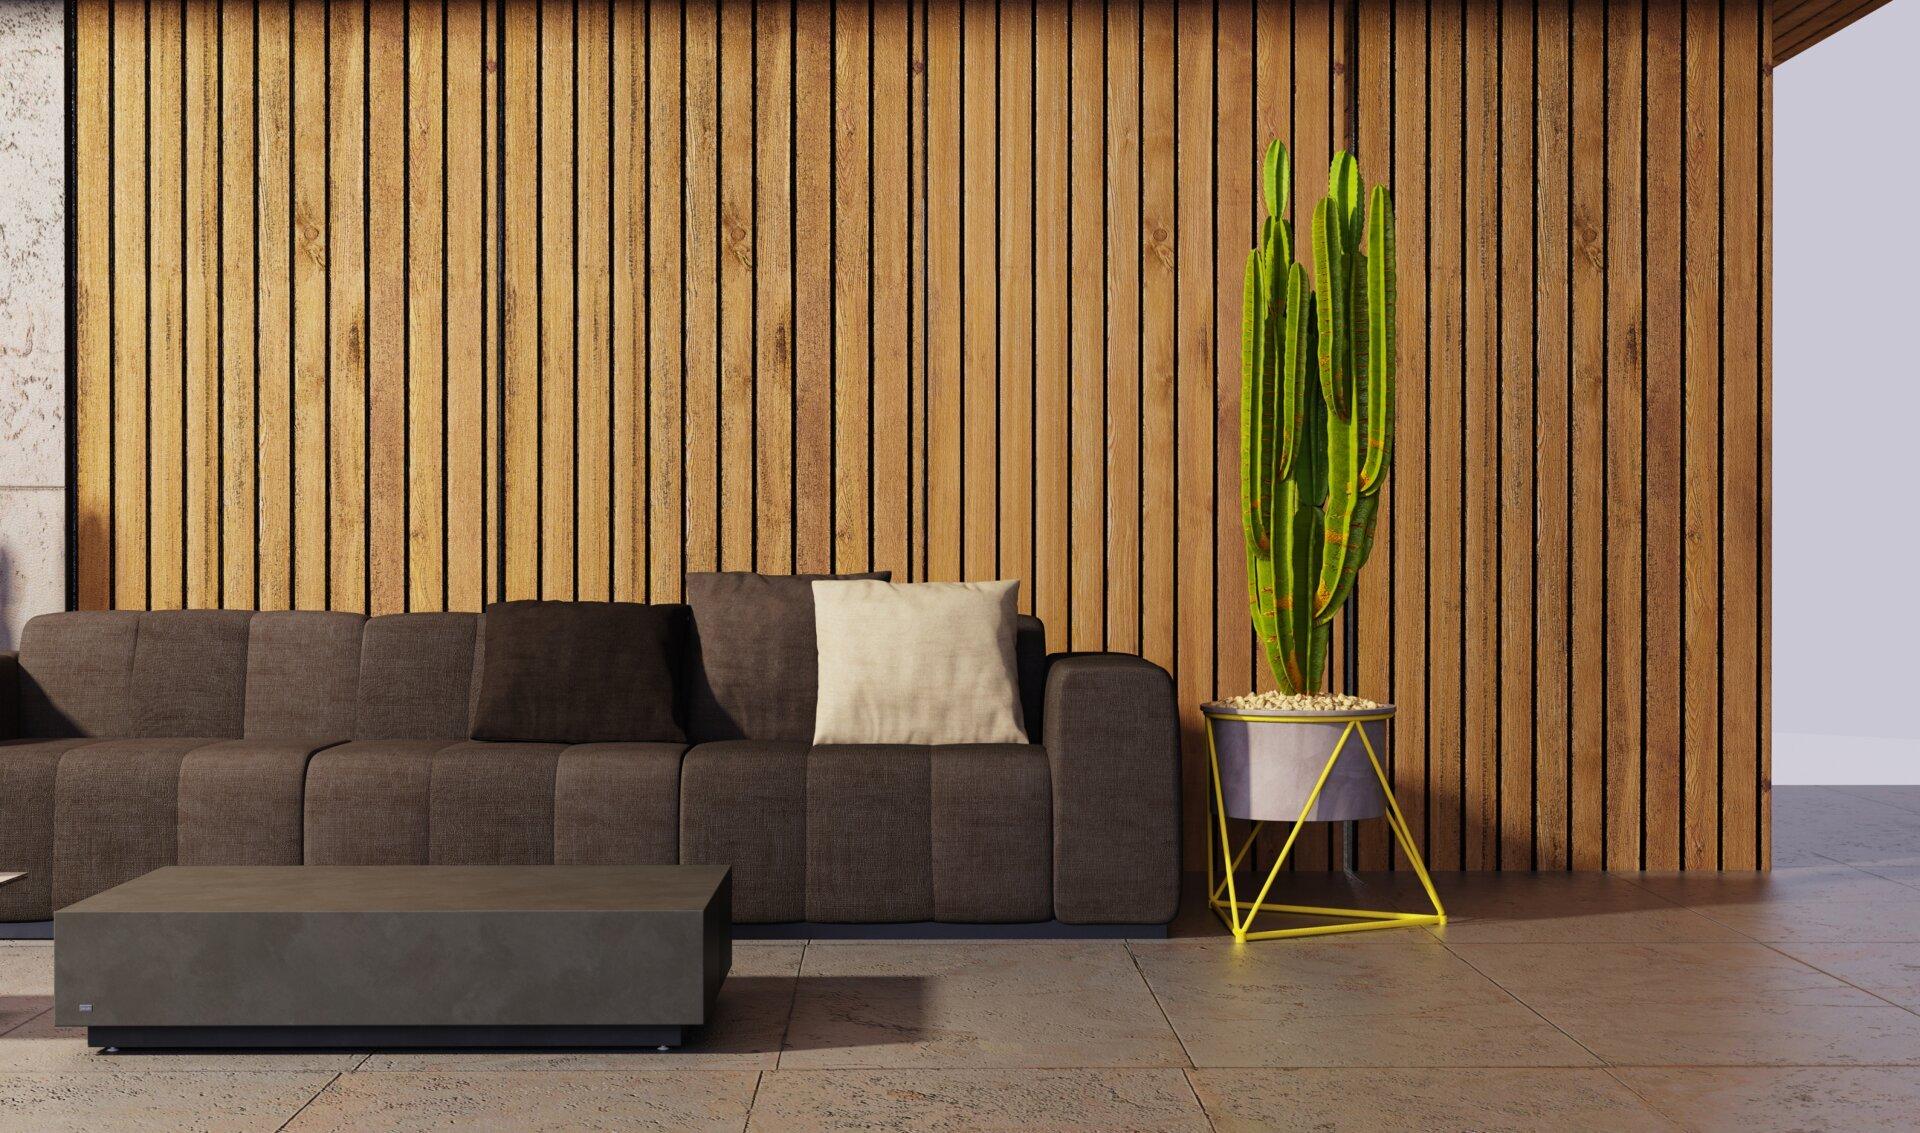 Model: Cushions S20 © Digital Render